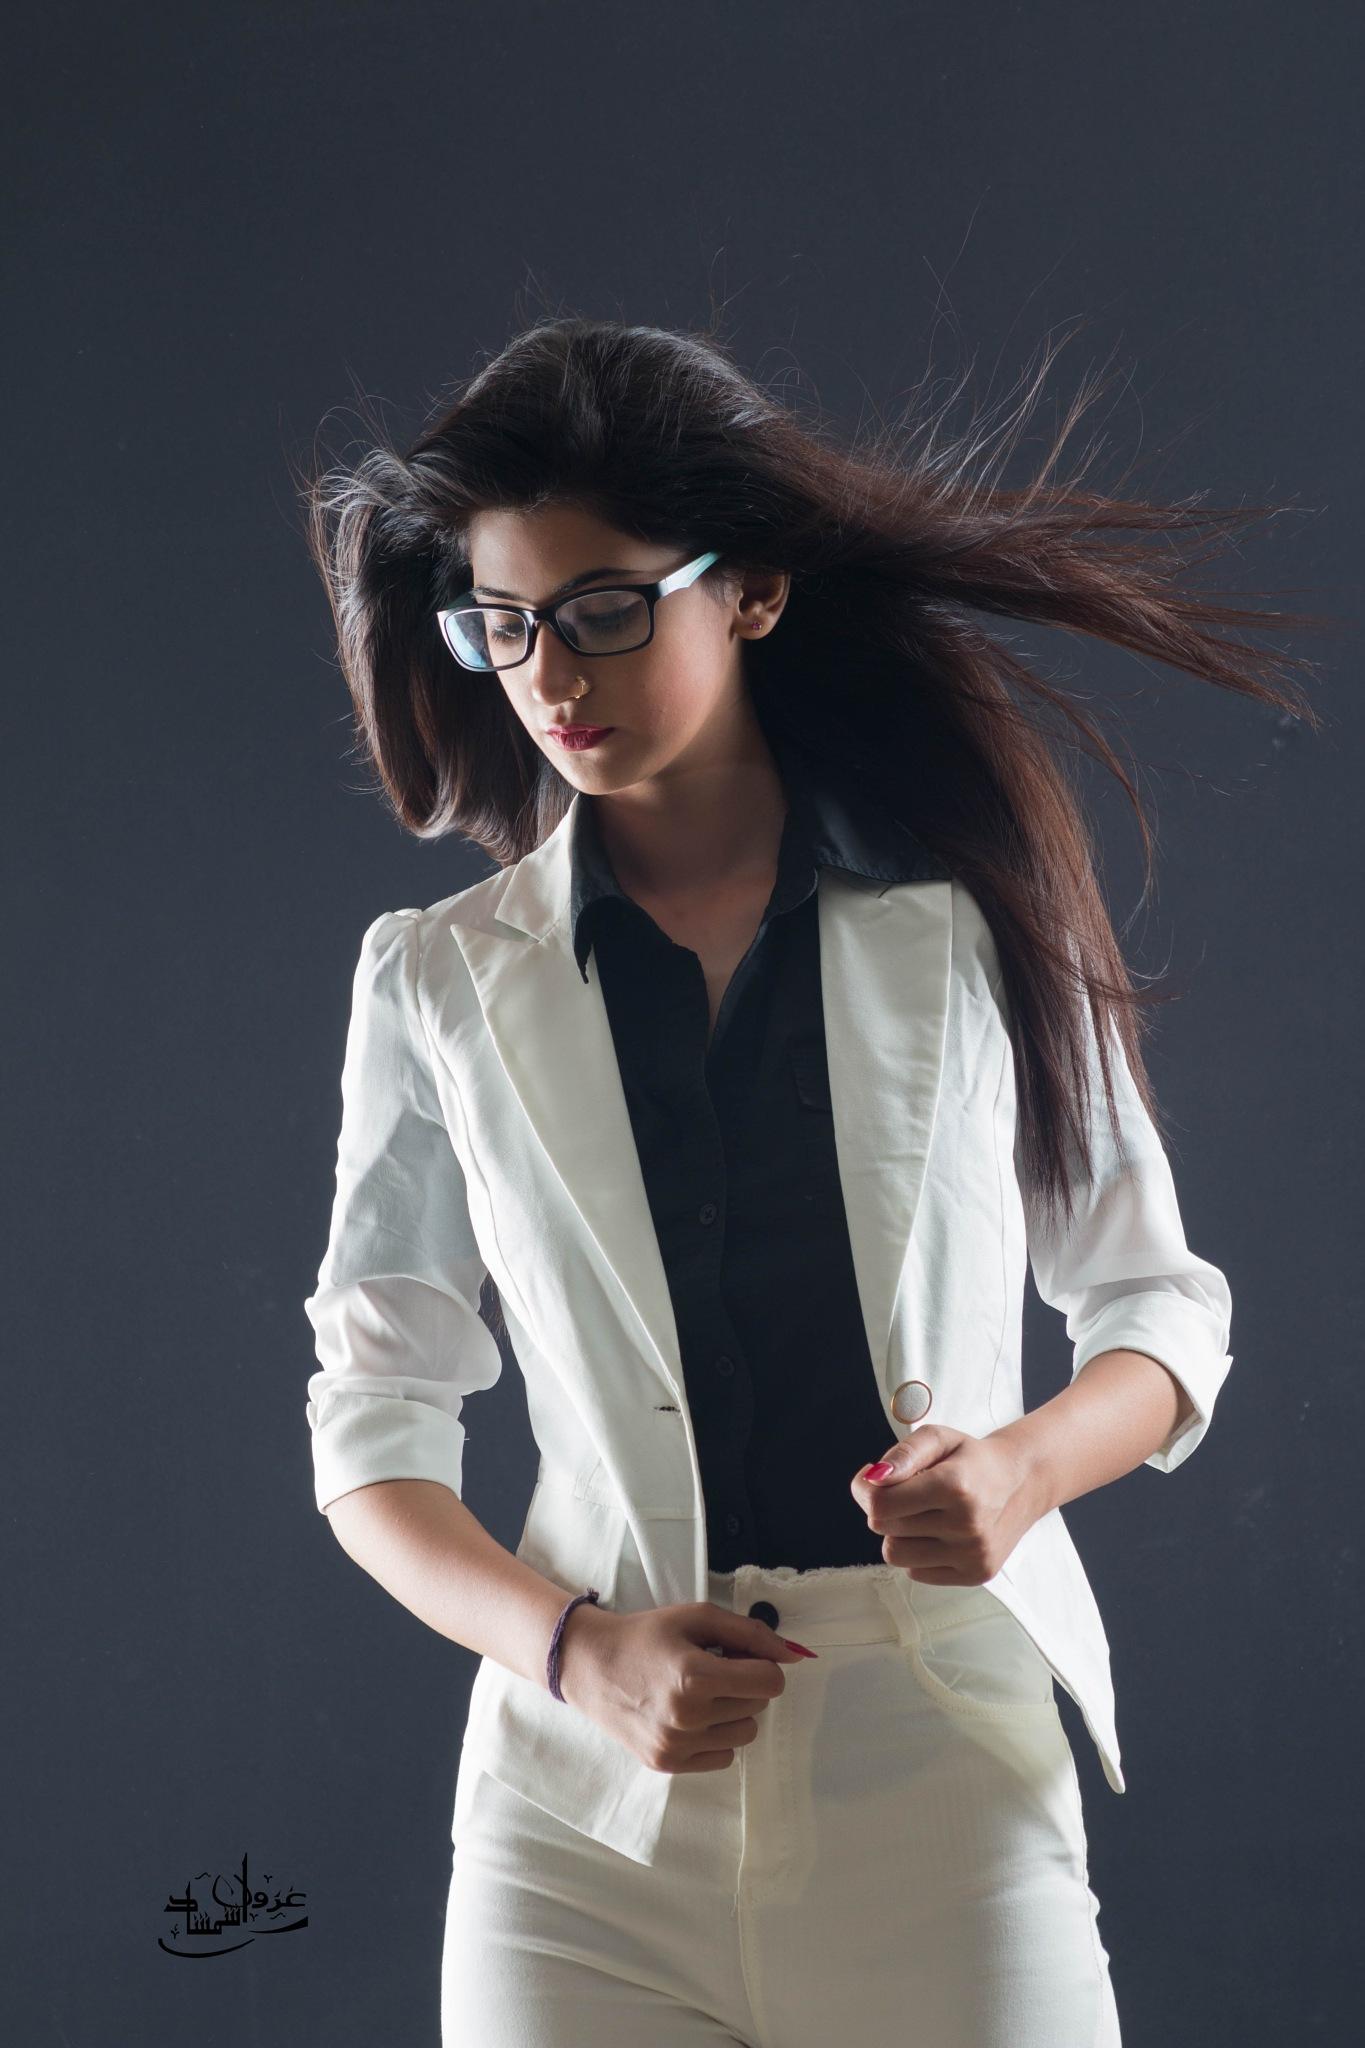 Into the Wind by ghezwanshamshad